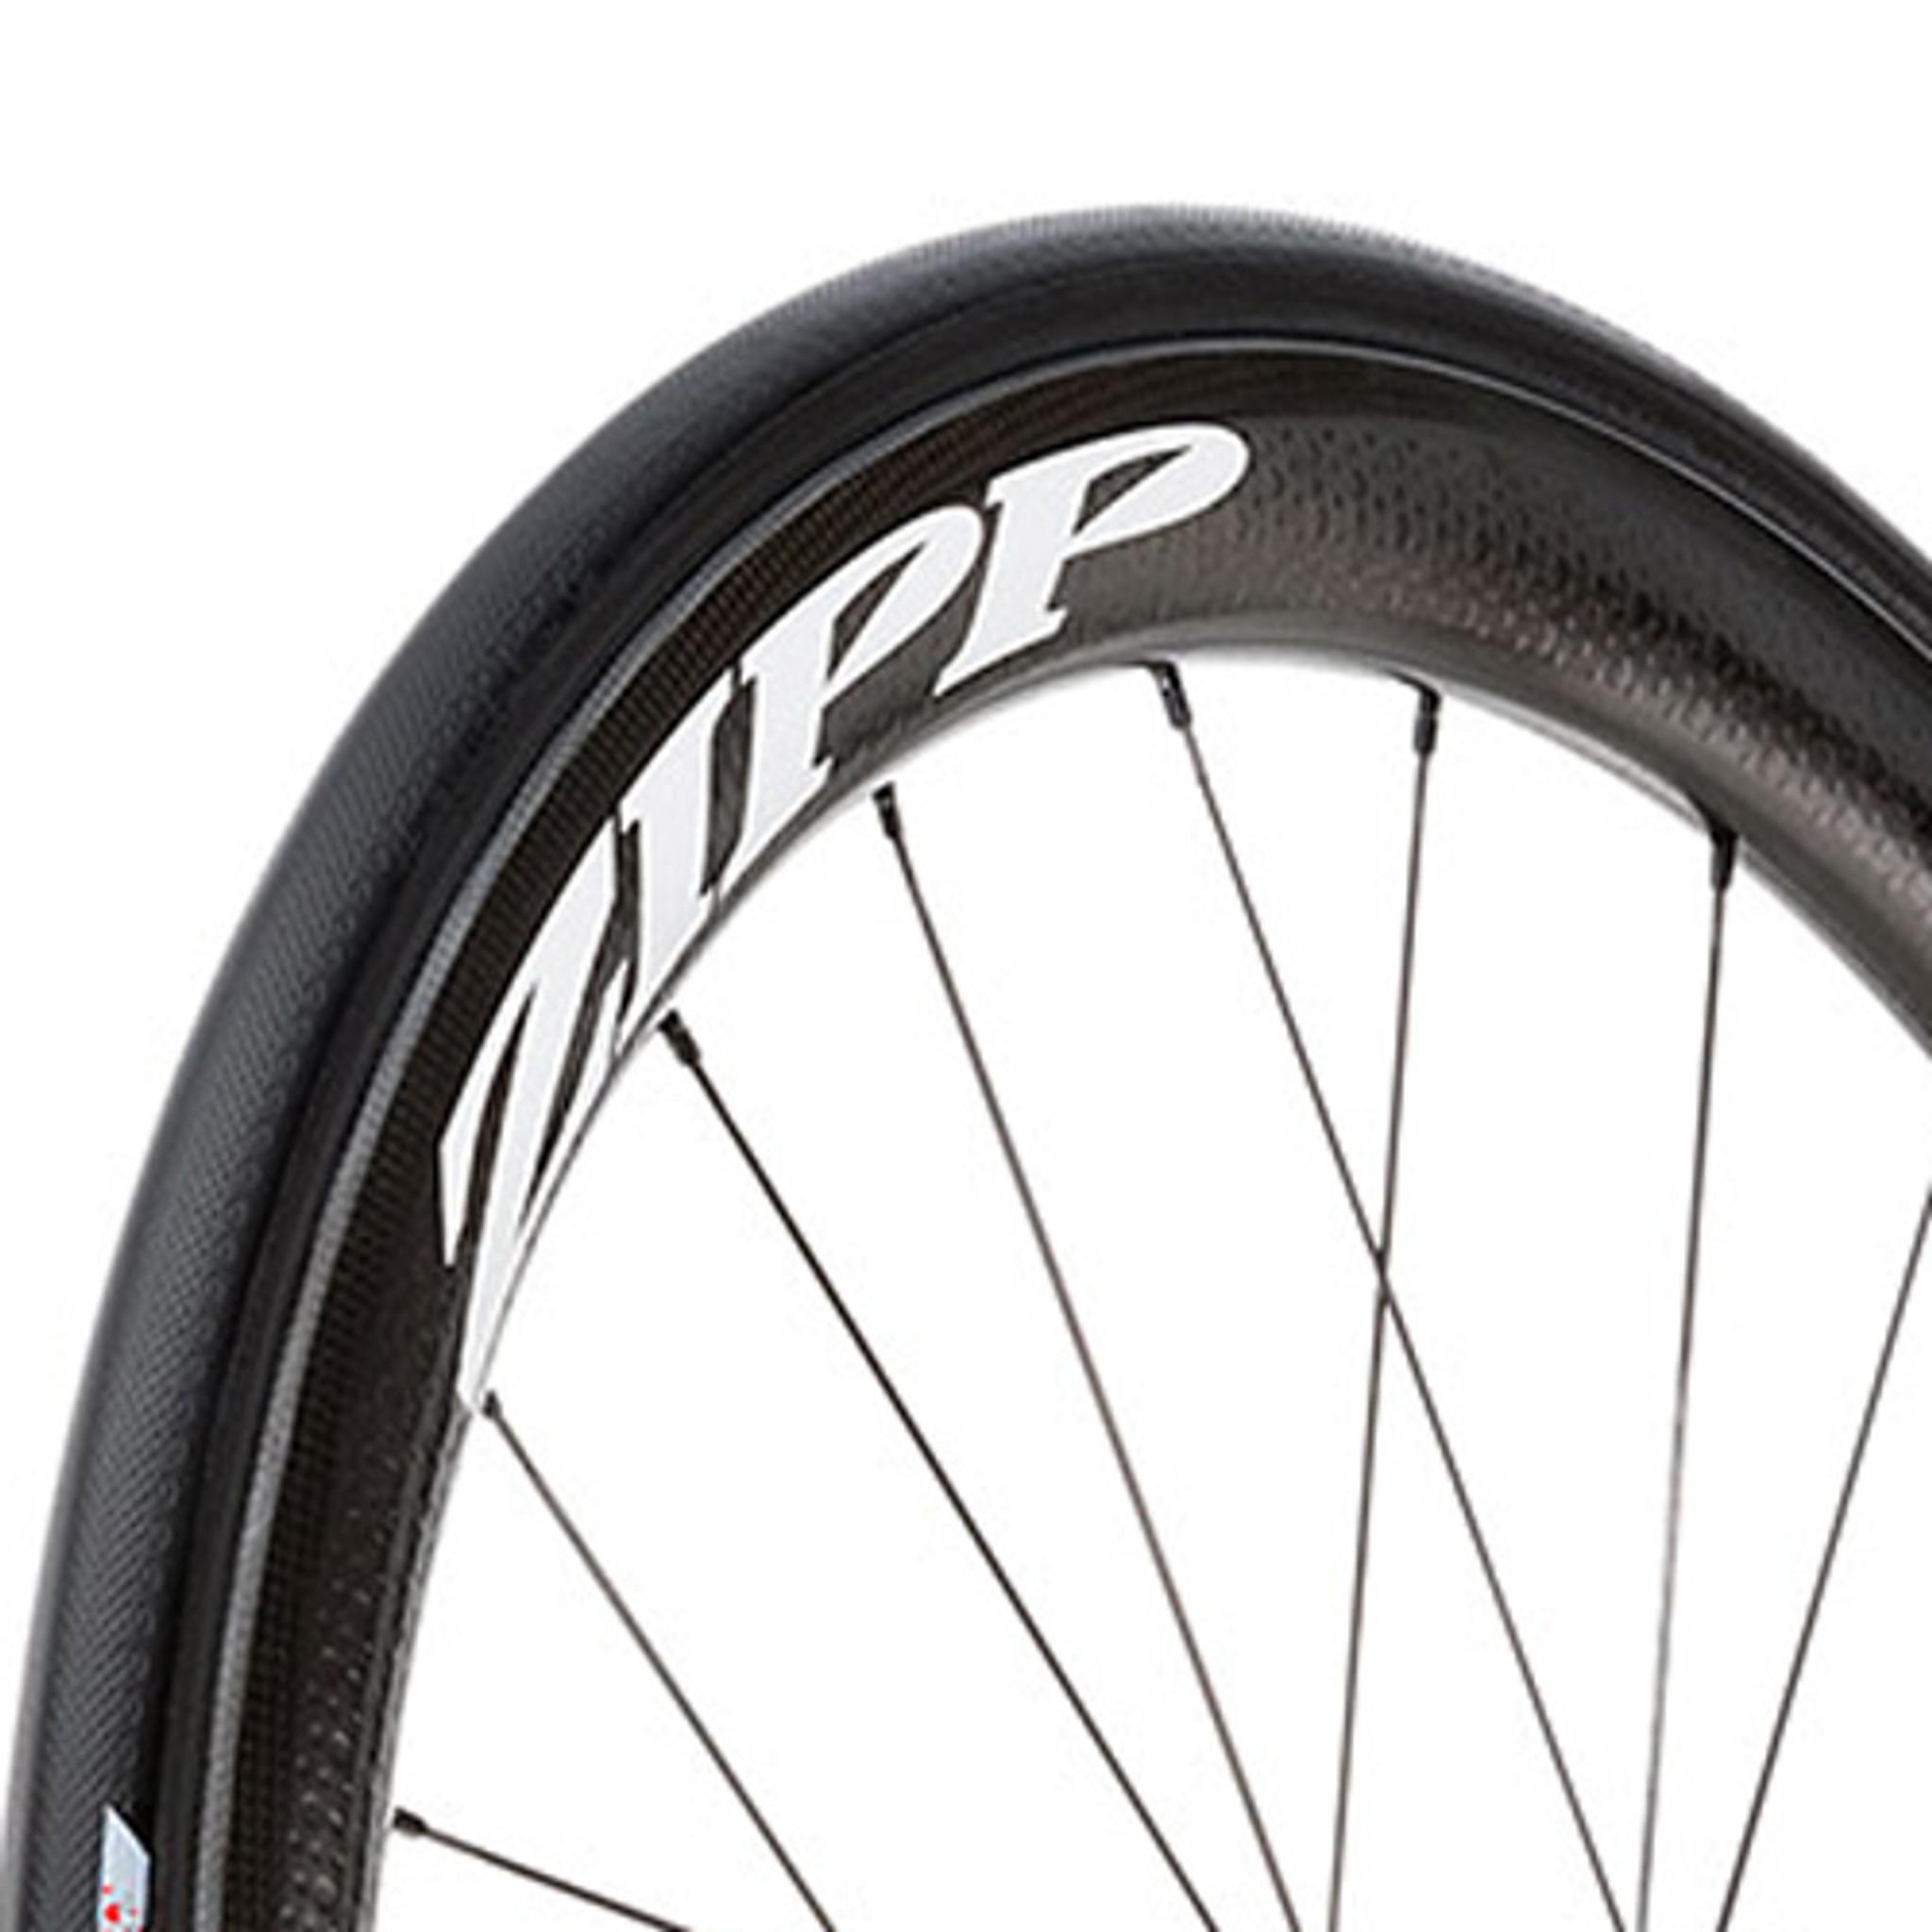 Zipp Decal Set-404-Matte Pink Logo Complete-For Tubular//Carbon Clincher-New